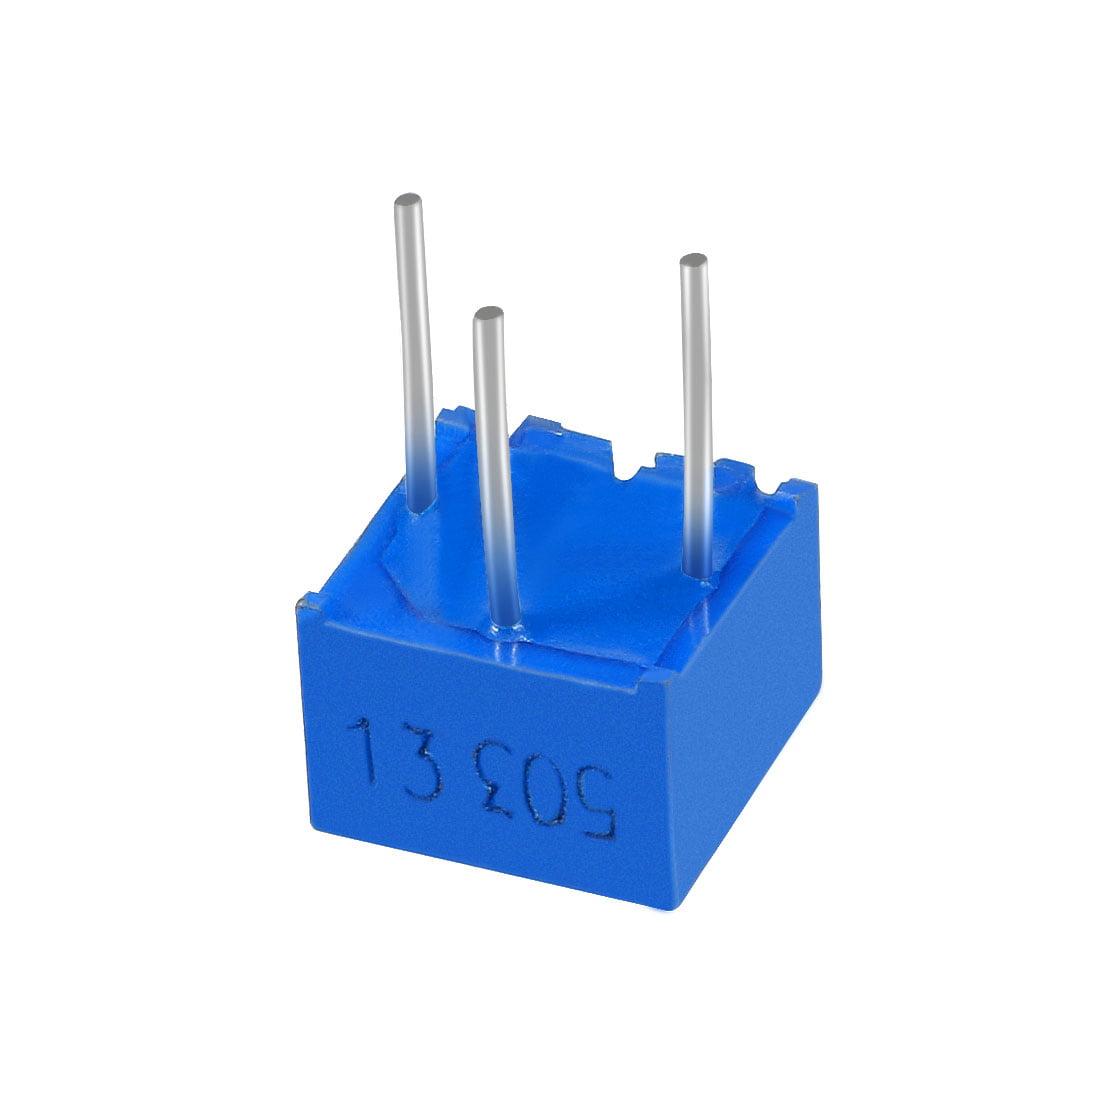 Resistors 50k Ohm Top Adjustment Horizontal Cermet Potentiometer 2 Pcs - image 3 of 6